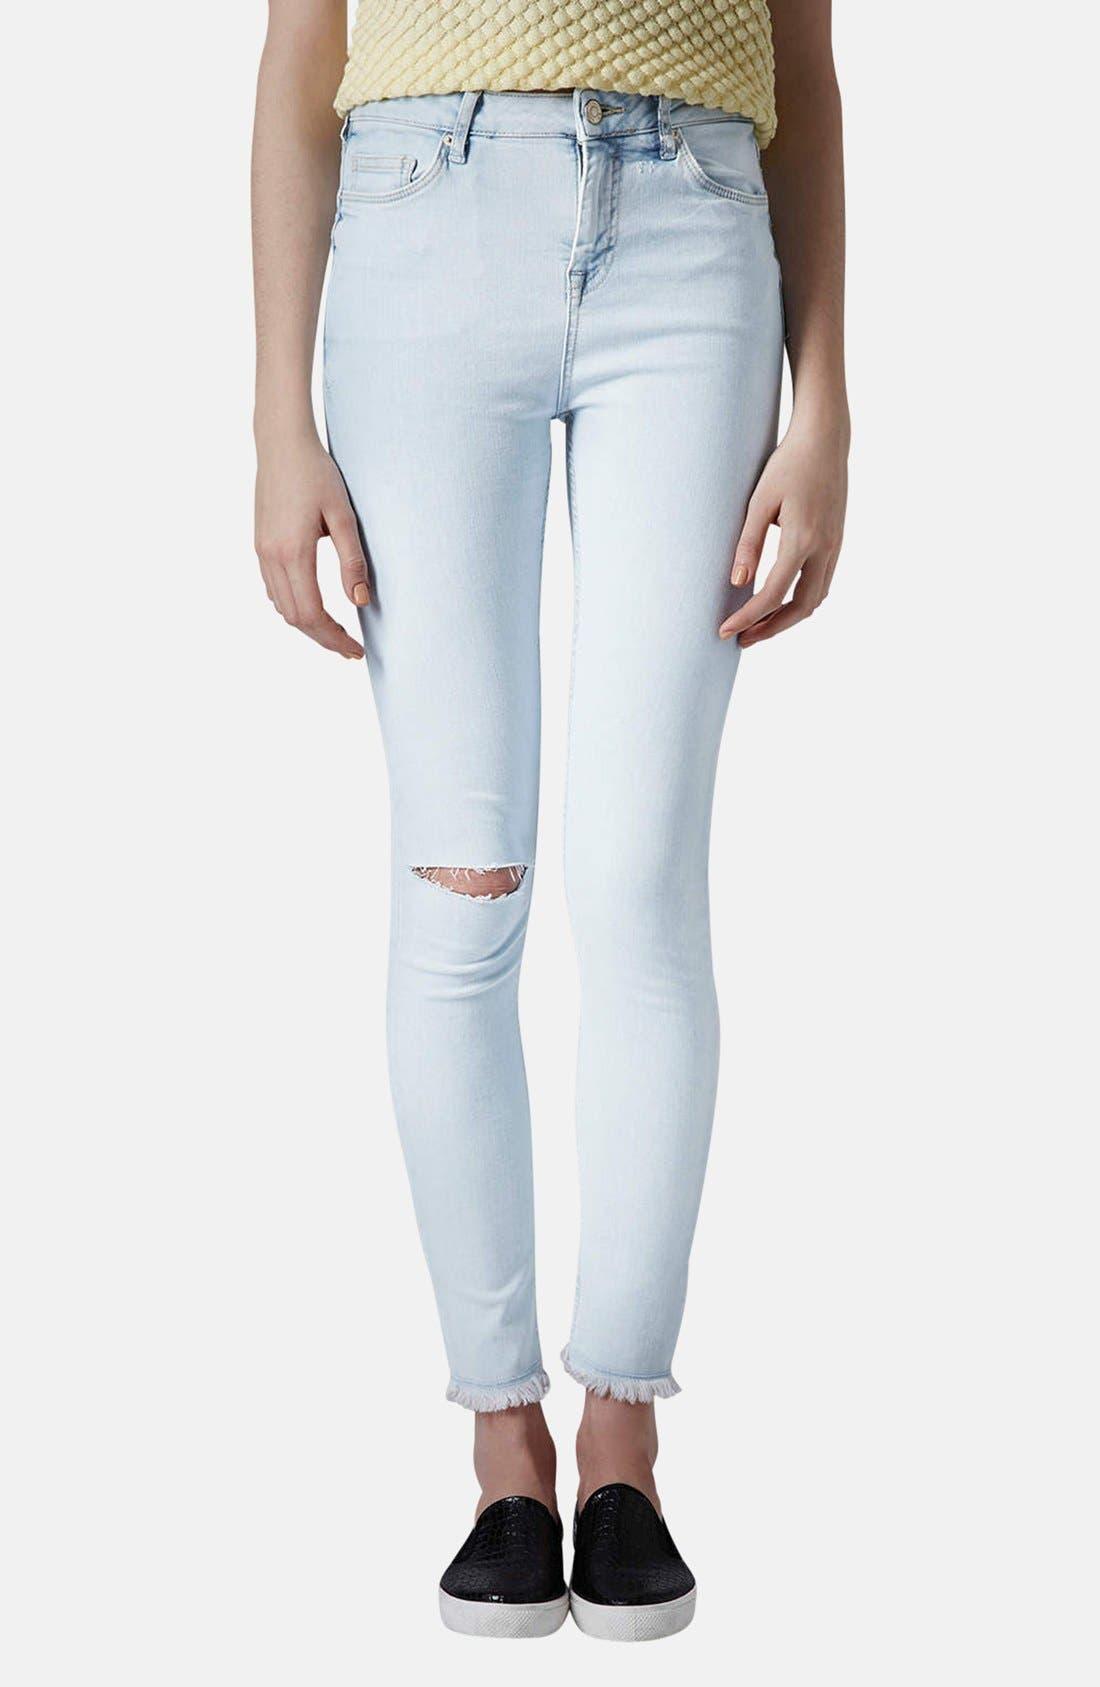 Main Image - Topshop Moto 'Jamie' High Rise Skinny Jeans (Light Blue) (Regular & Short)